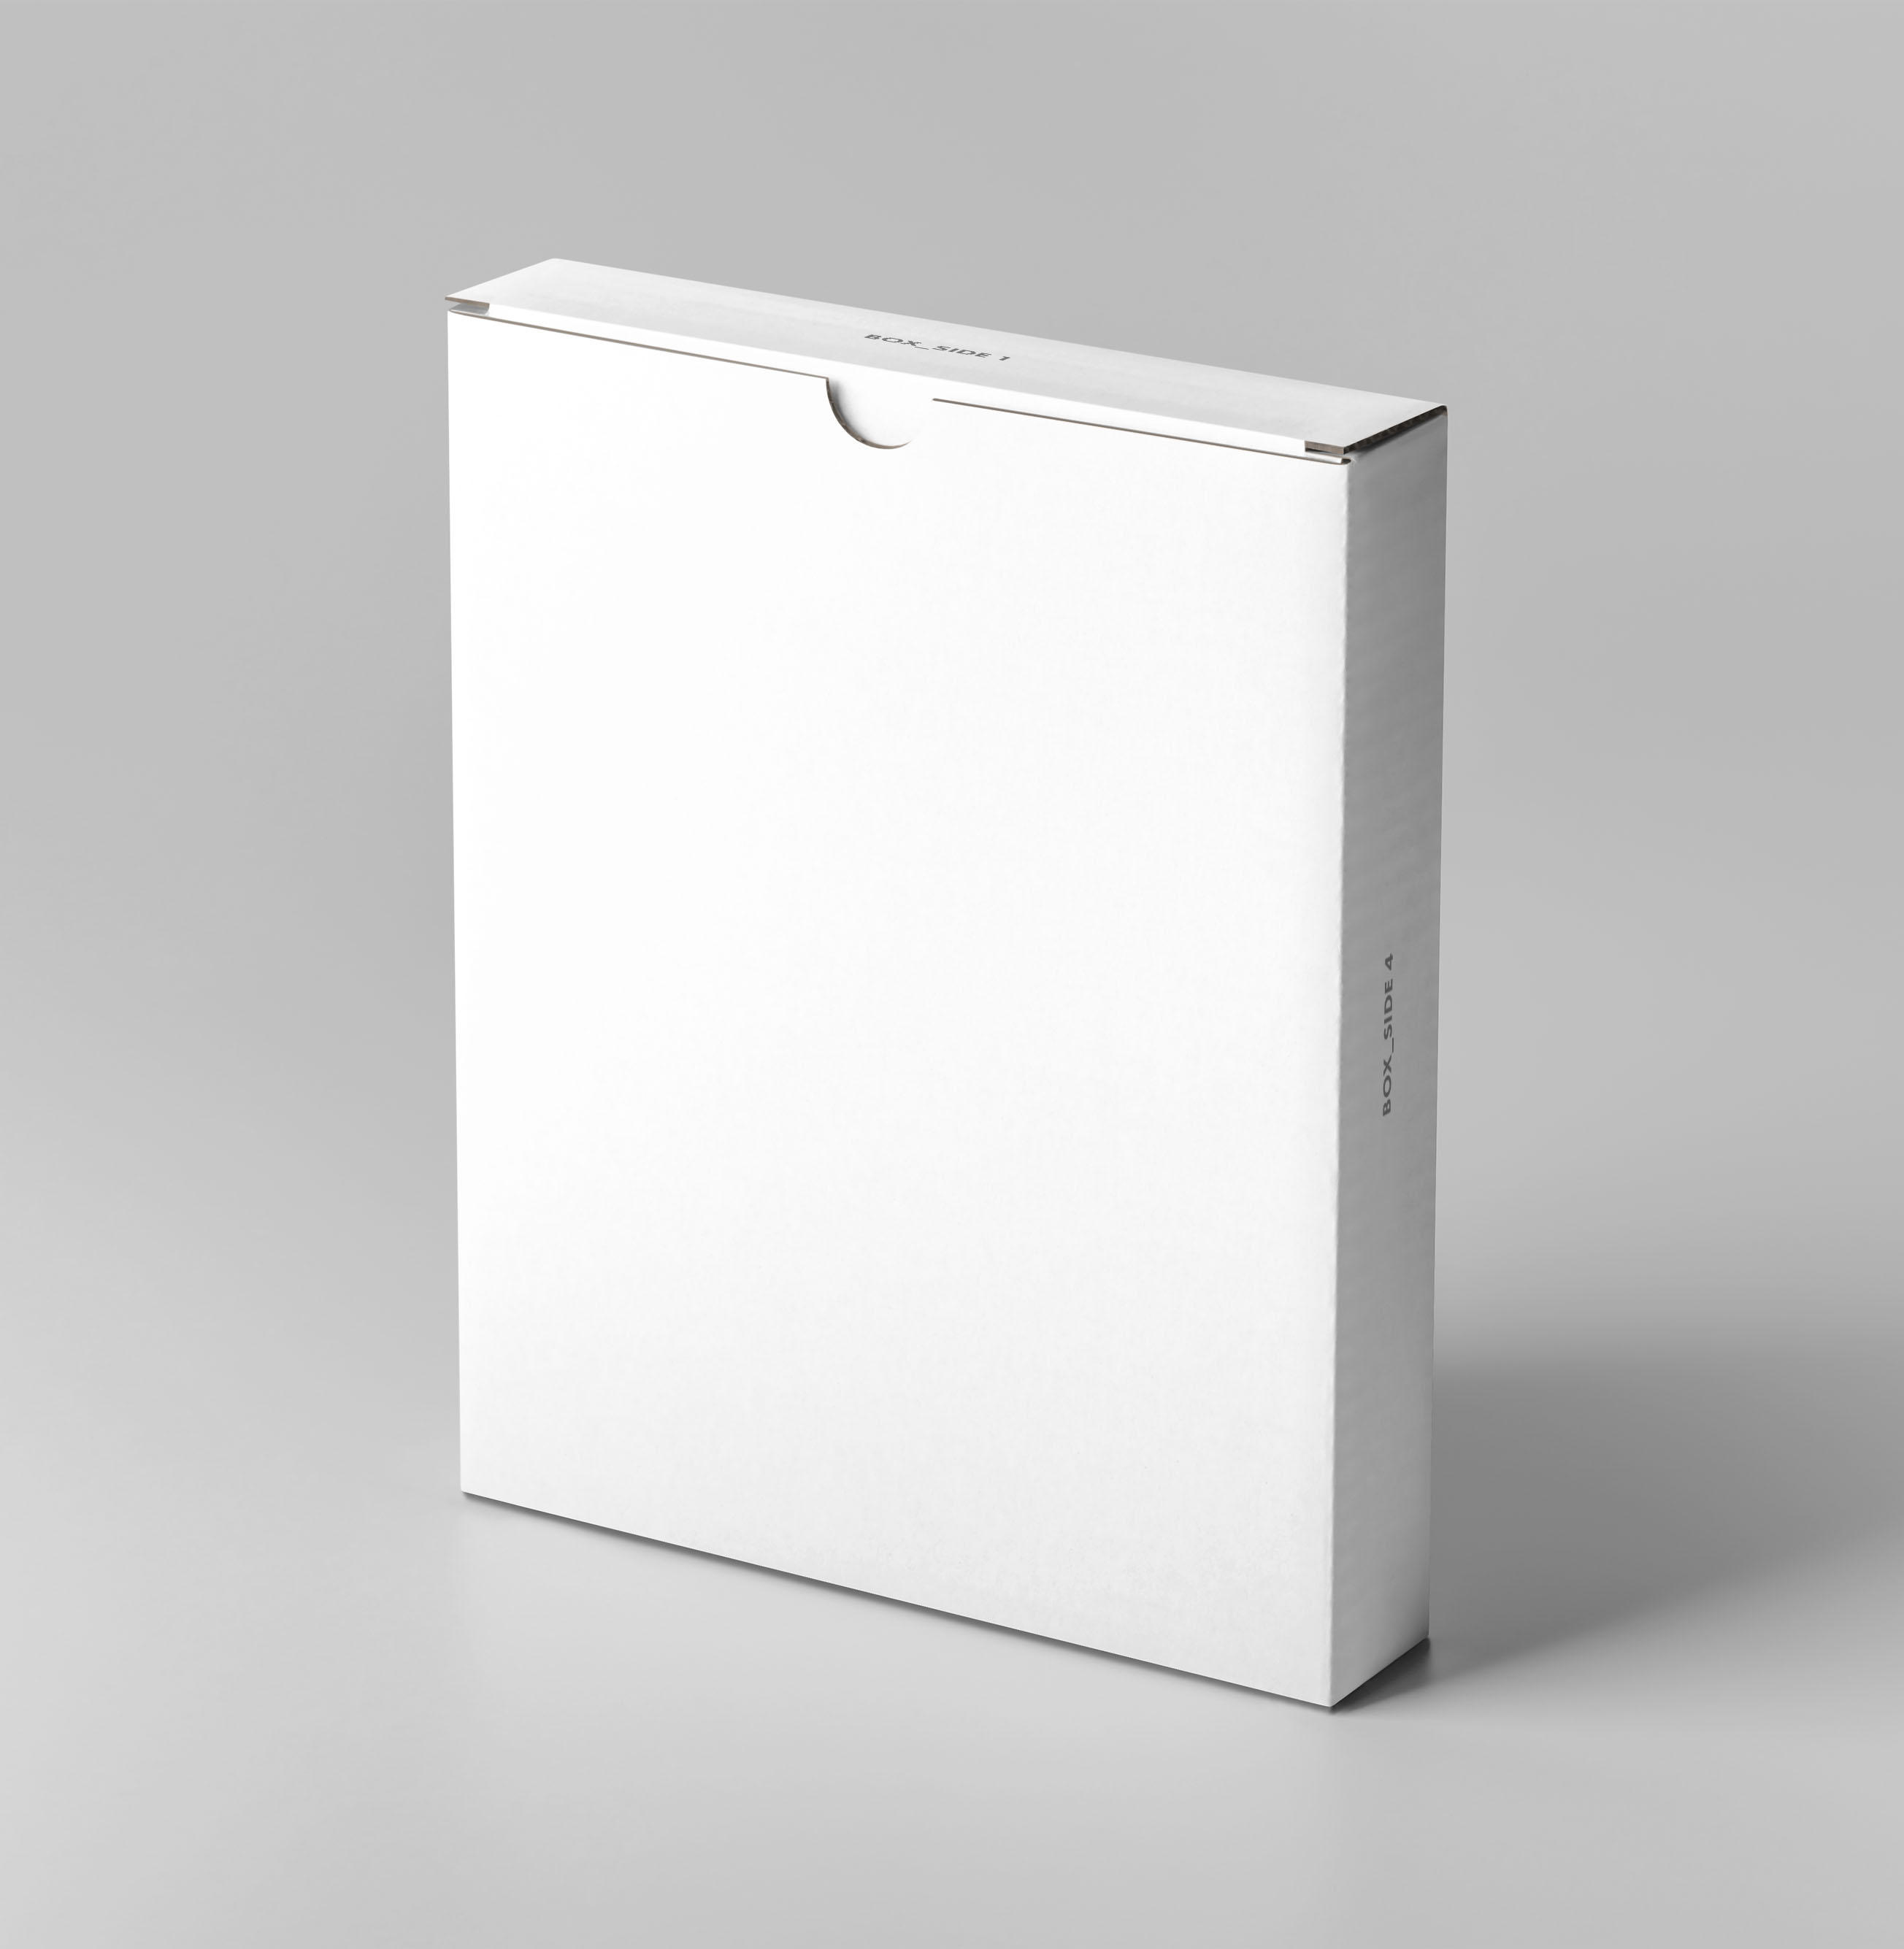 Flat Box Mockup example image 5